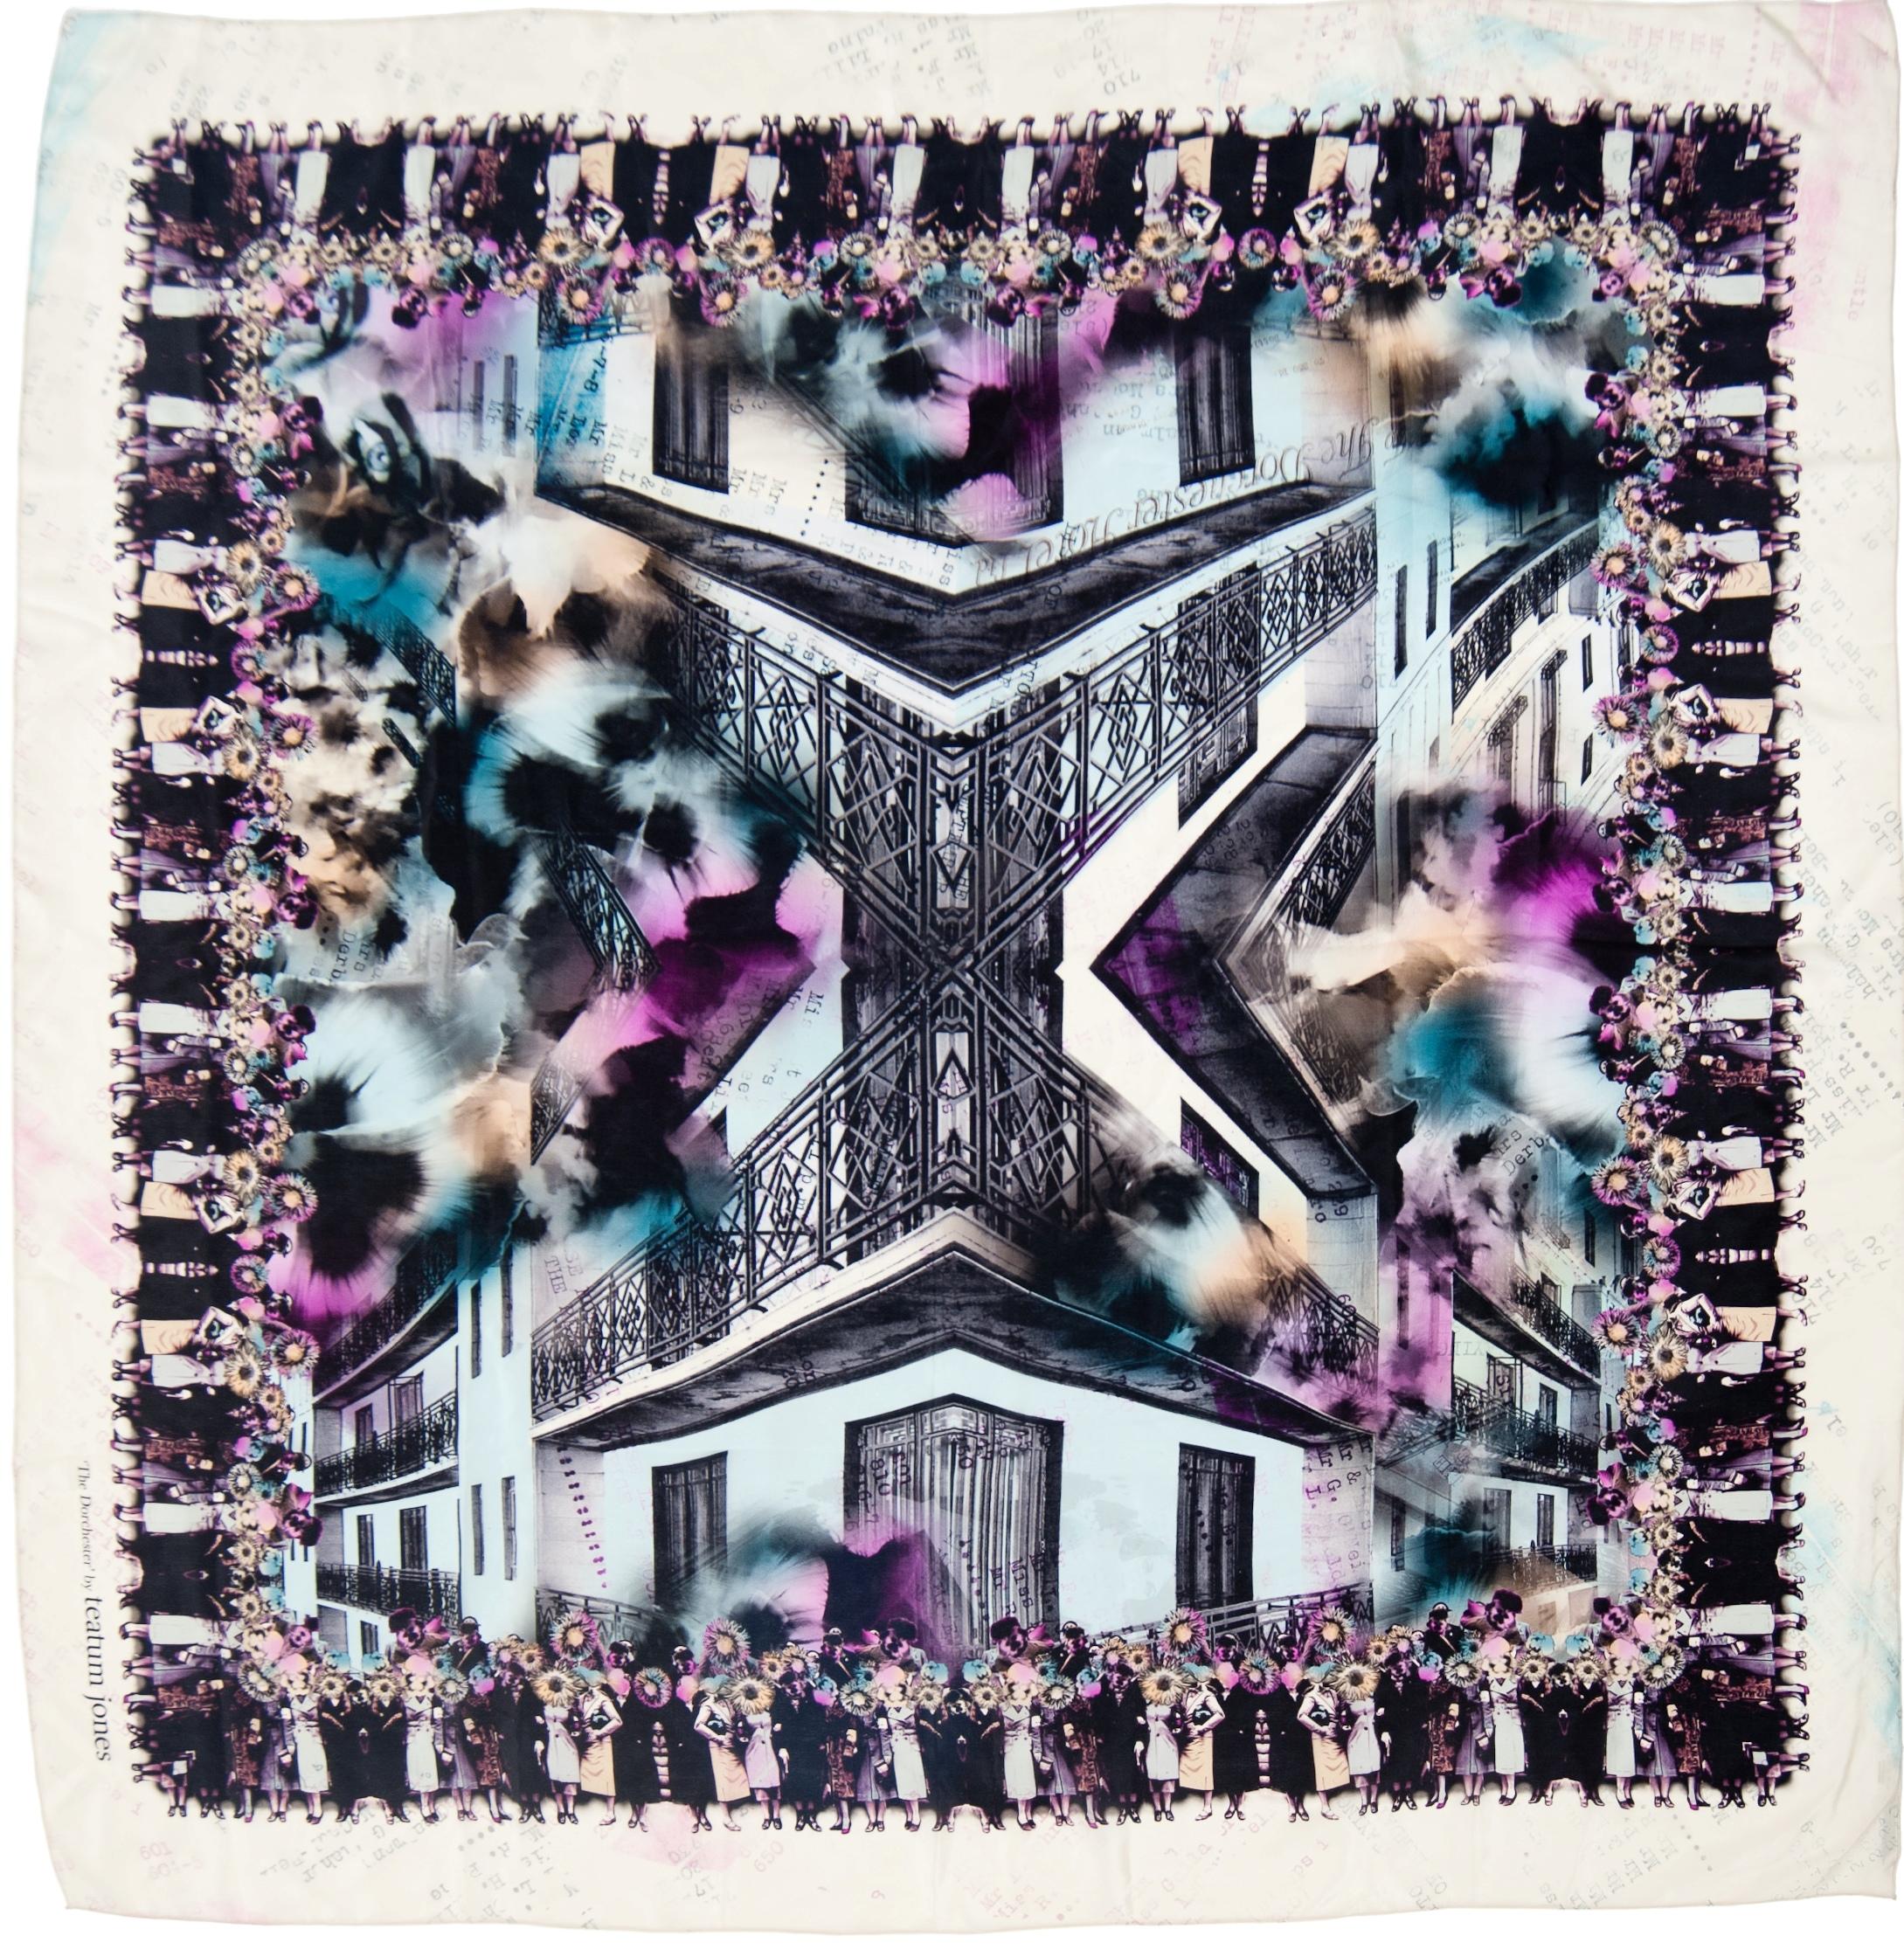 Dorchester Collection www.jamesbedford.com